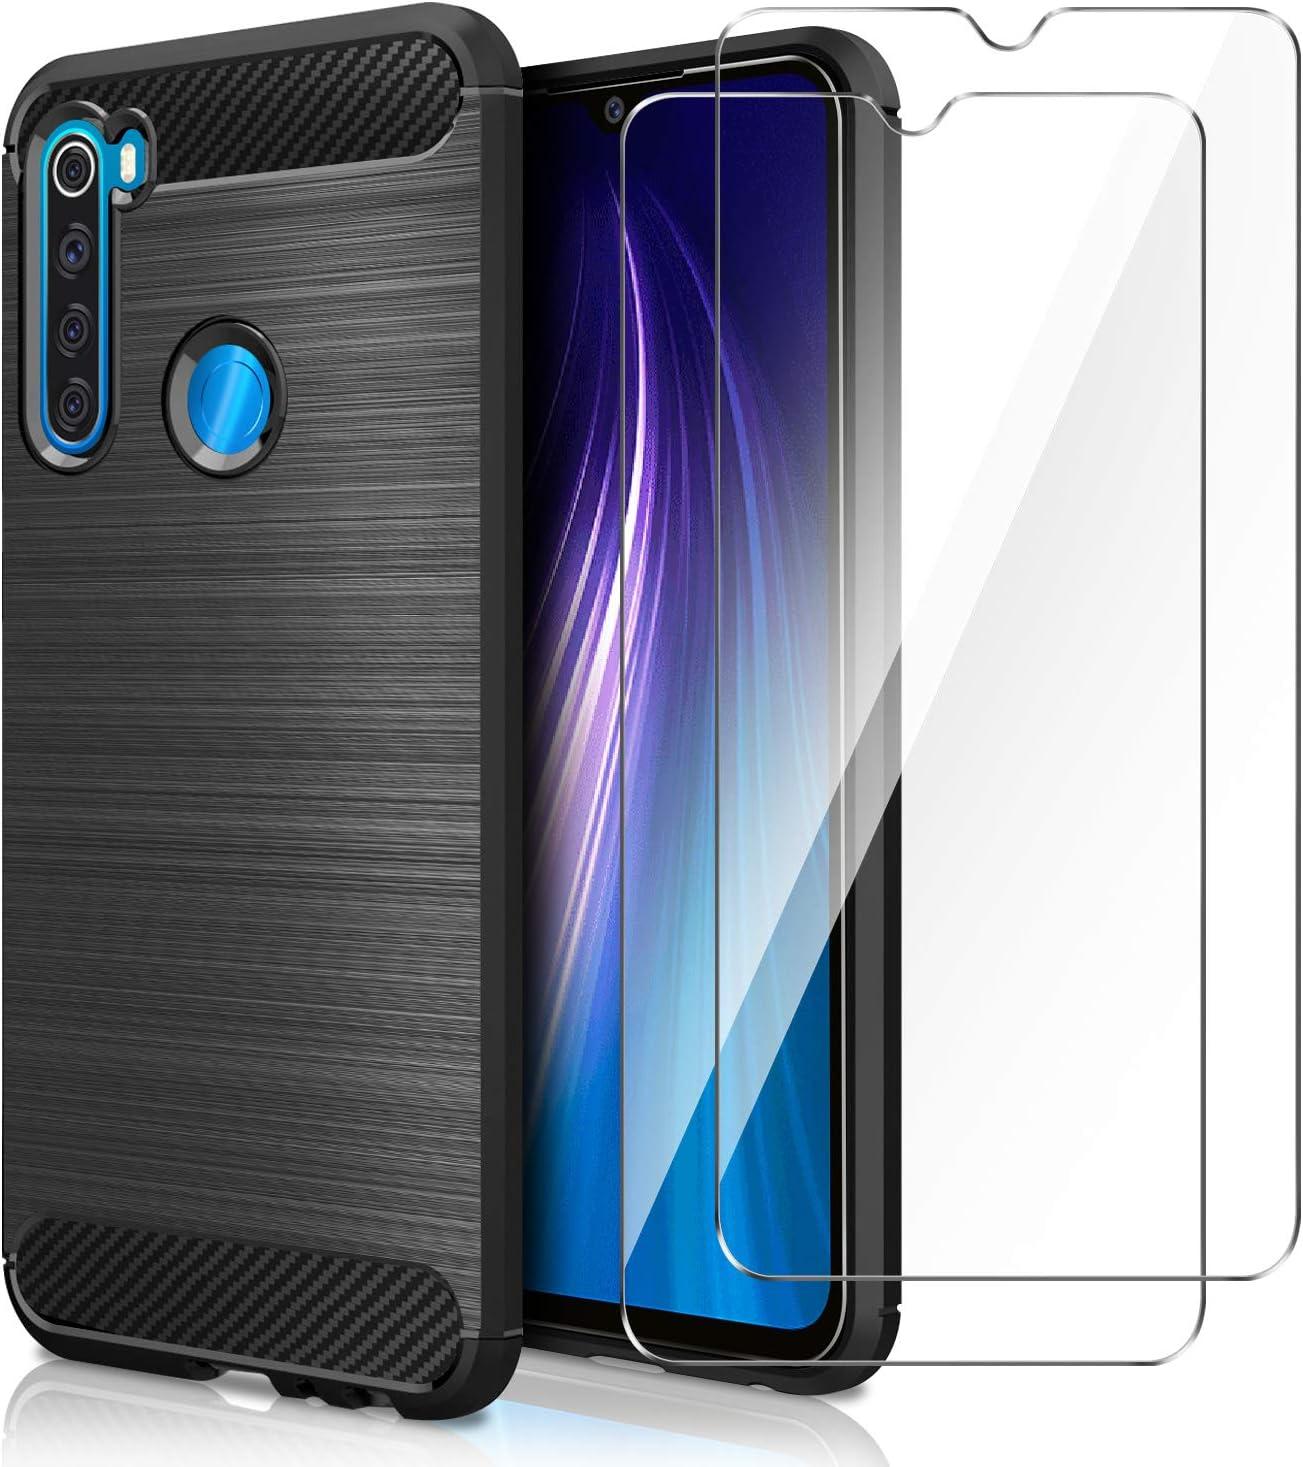 AROYI Funda Xiaomi Redmi Note 8, [2 Pack] Cristal Templado, Carcasa Silicona Fibra de Carbono TPU Alta Resistente y Flexibilidad Fundas Cover Caso para Xiaomi Redmi Note 8-Negro